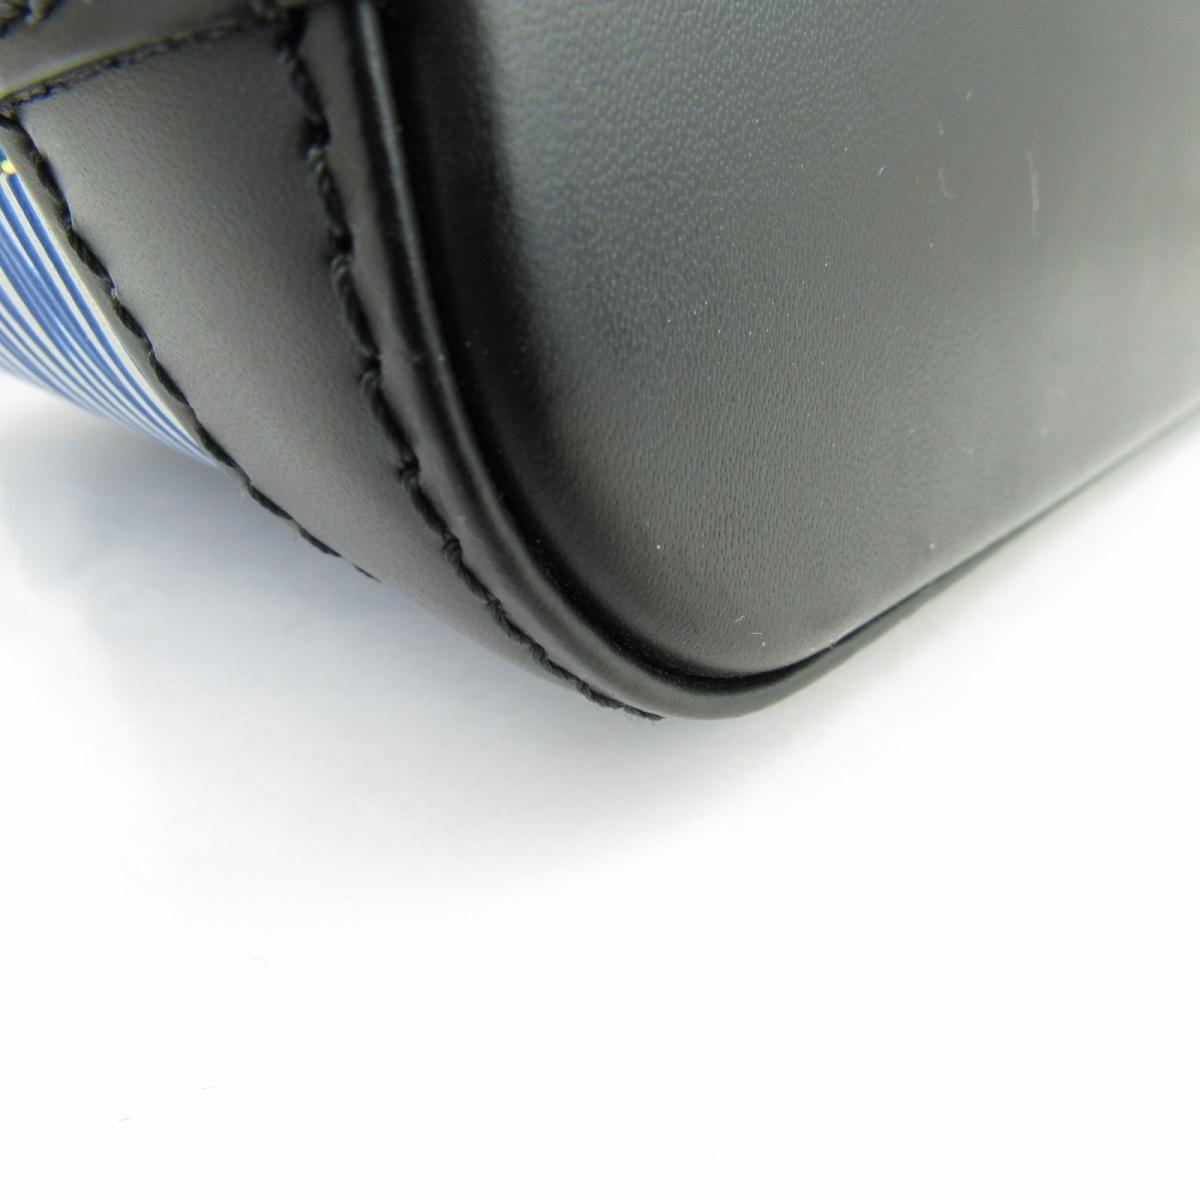 ea553aa27b56 (Free shipping) Auth LOUIS VUITTON Nano Alma Hand shoulder bag M41578 Epi  denim Blue Used